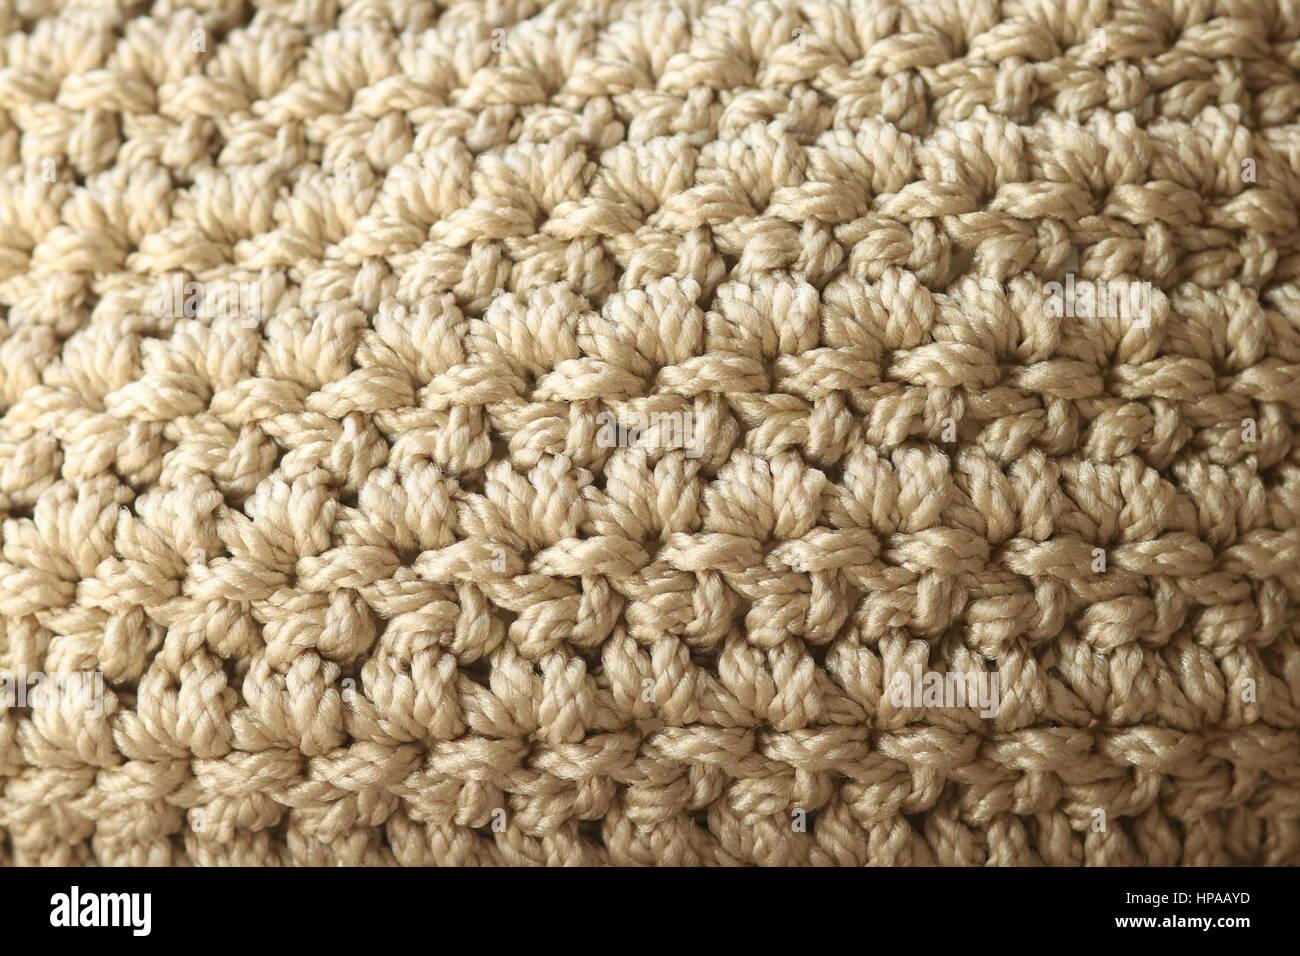 Close-up Neutral Color Double Crochet Stitch - Stock Image